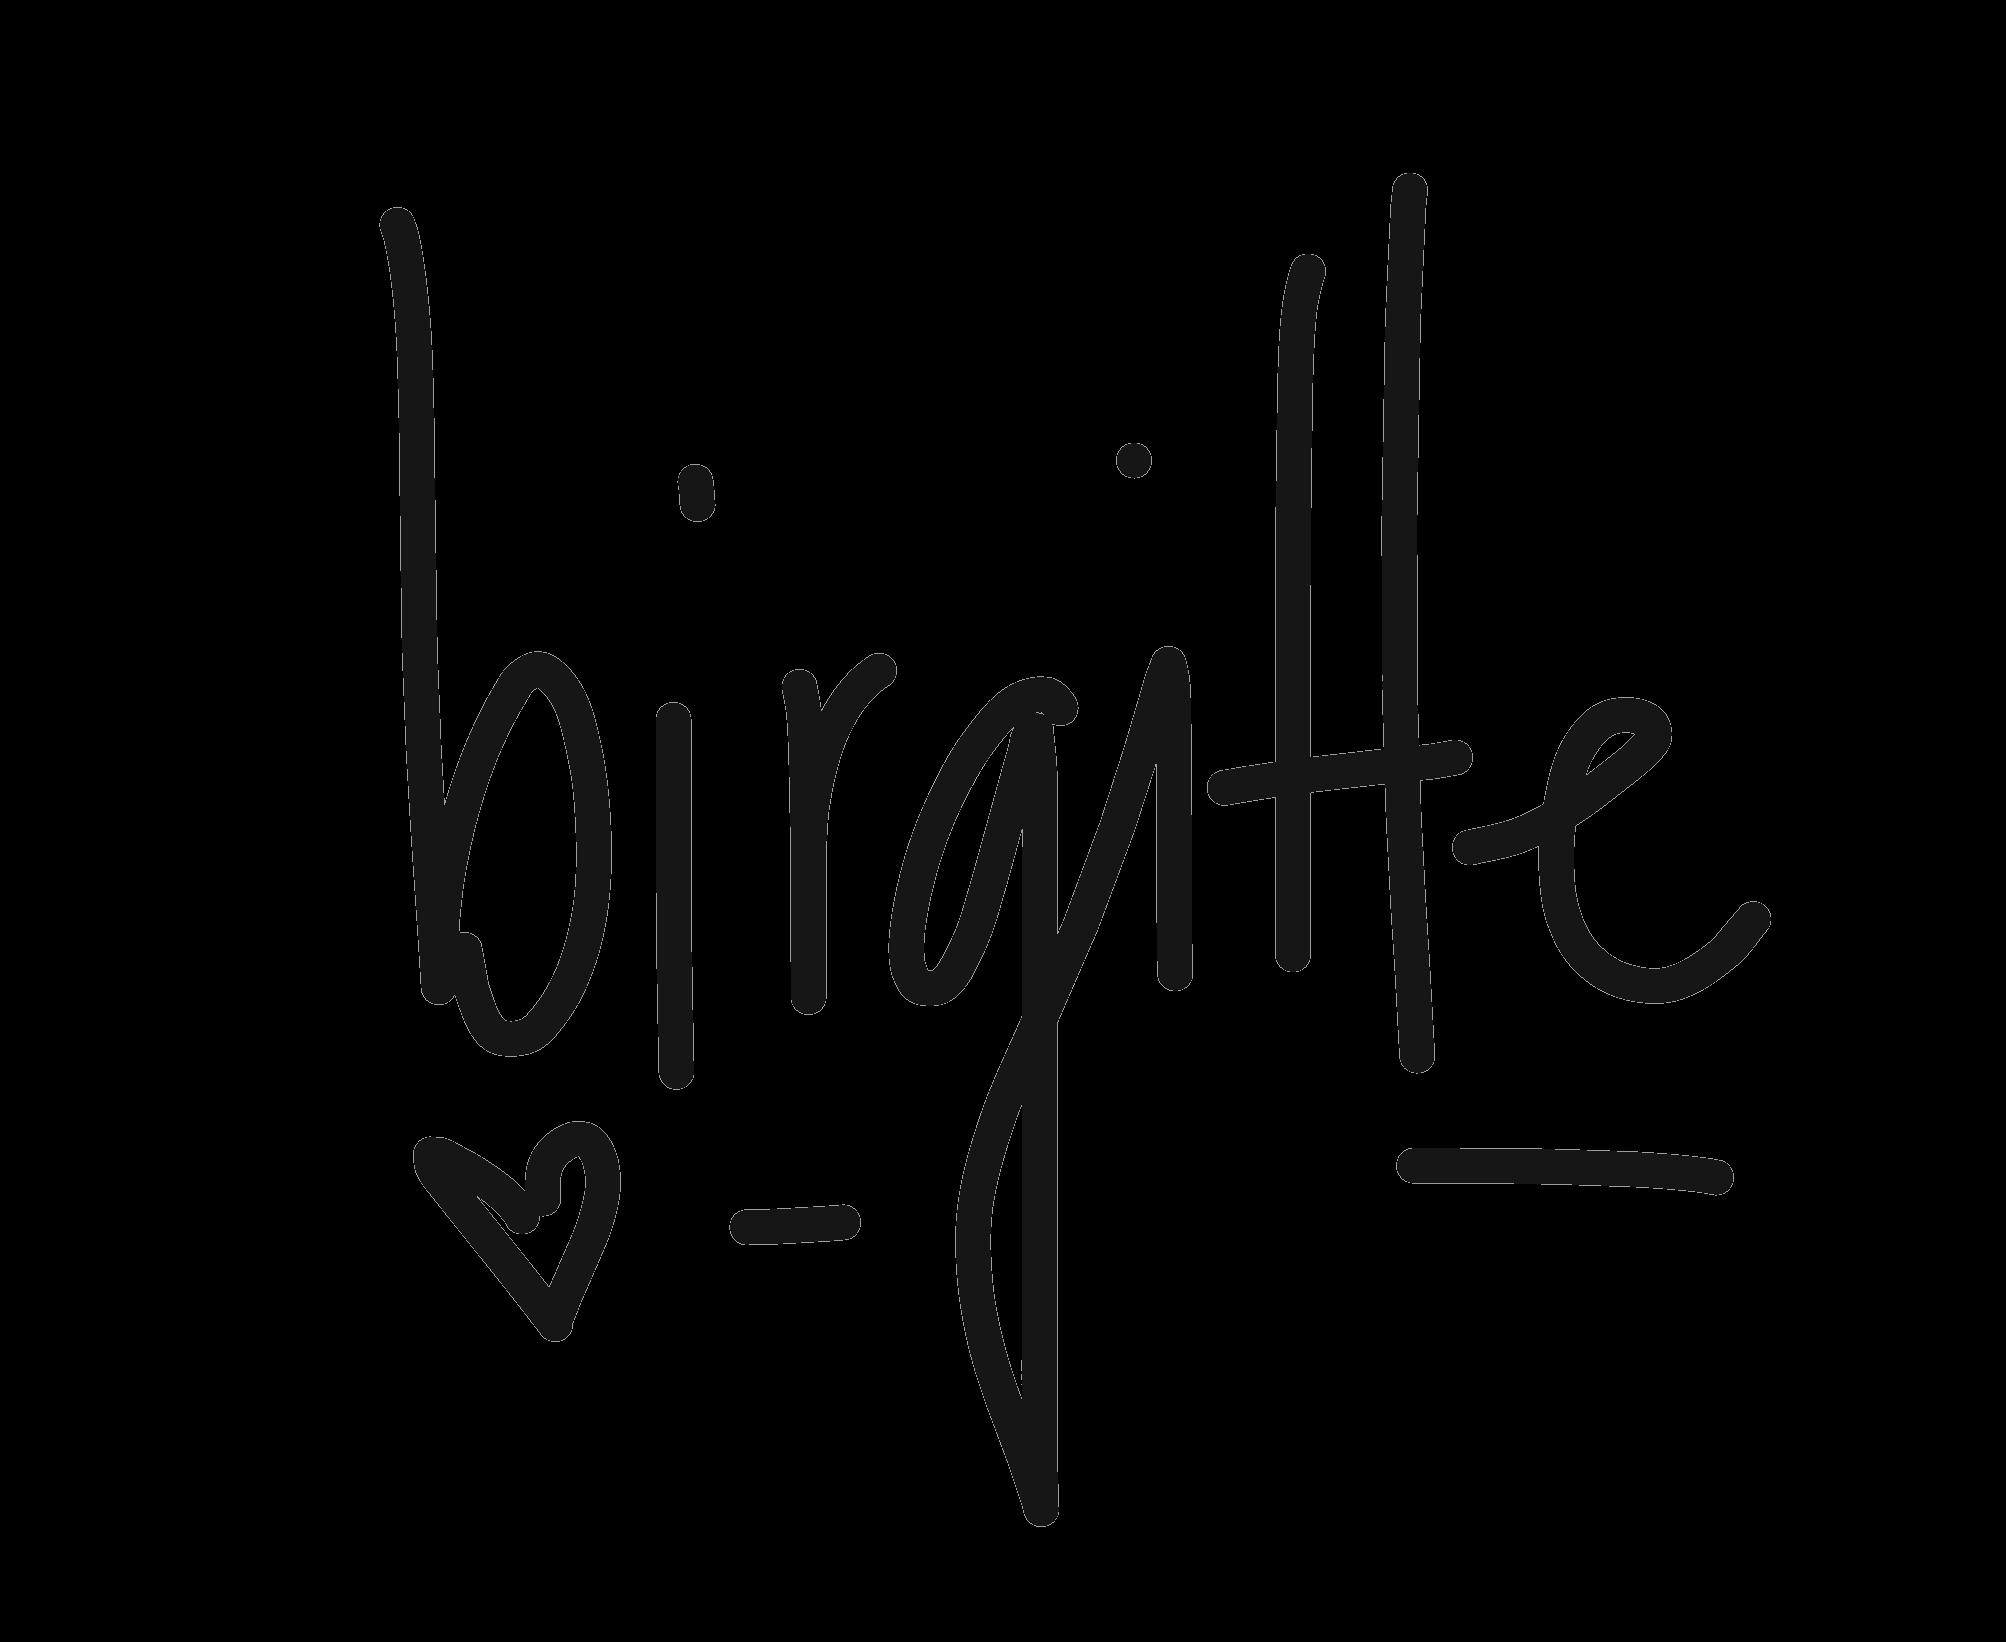 birgitte-underskrift-blog